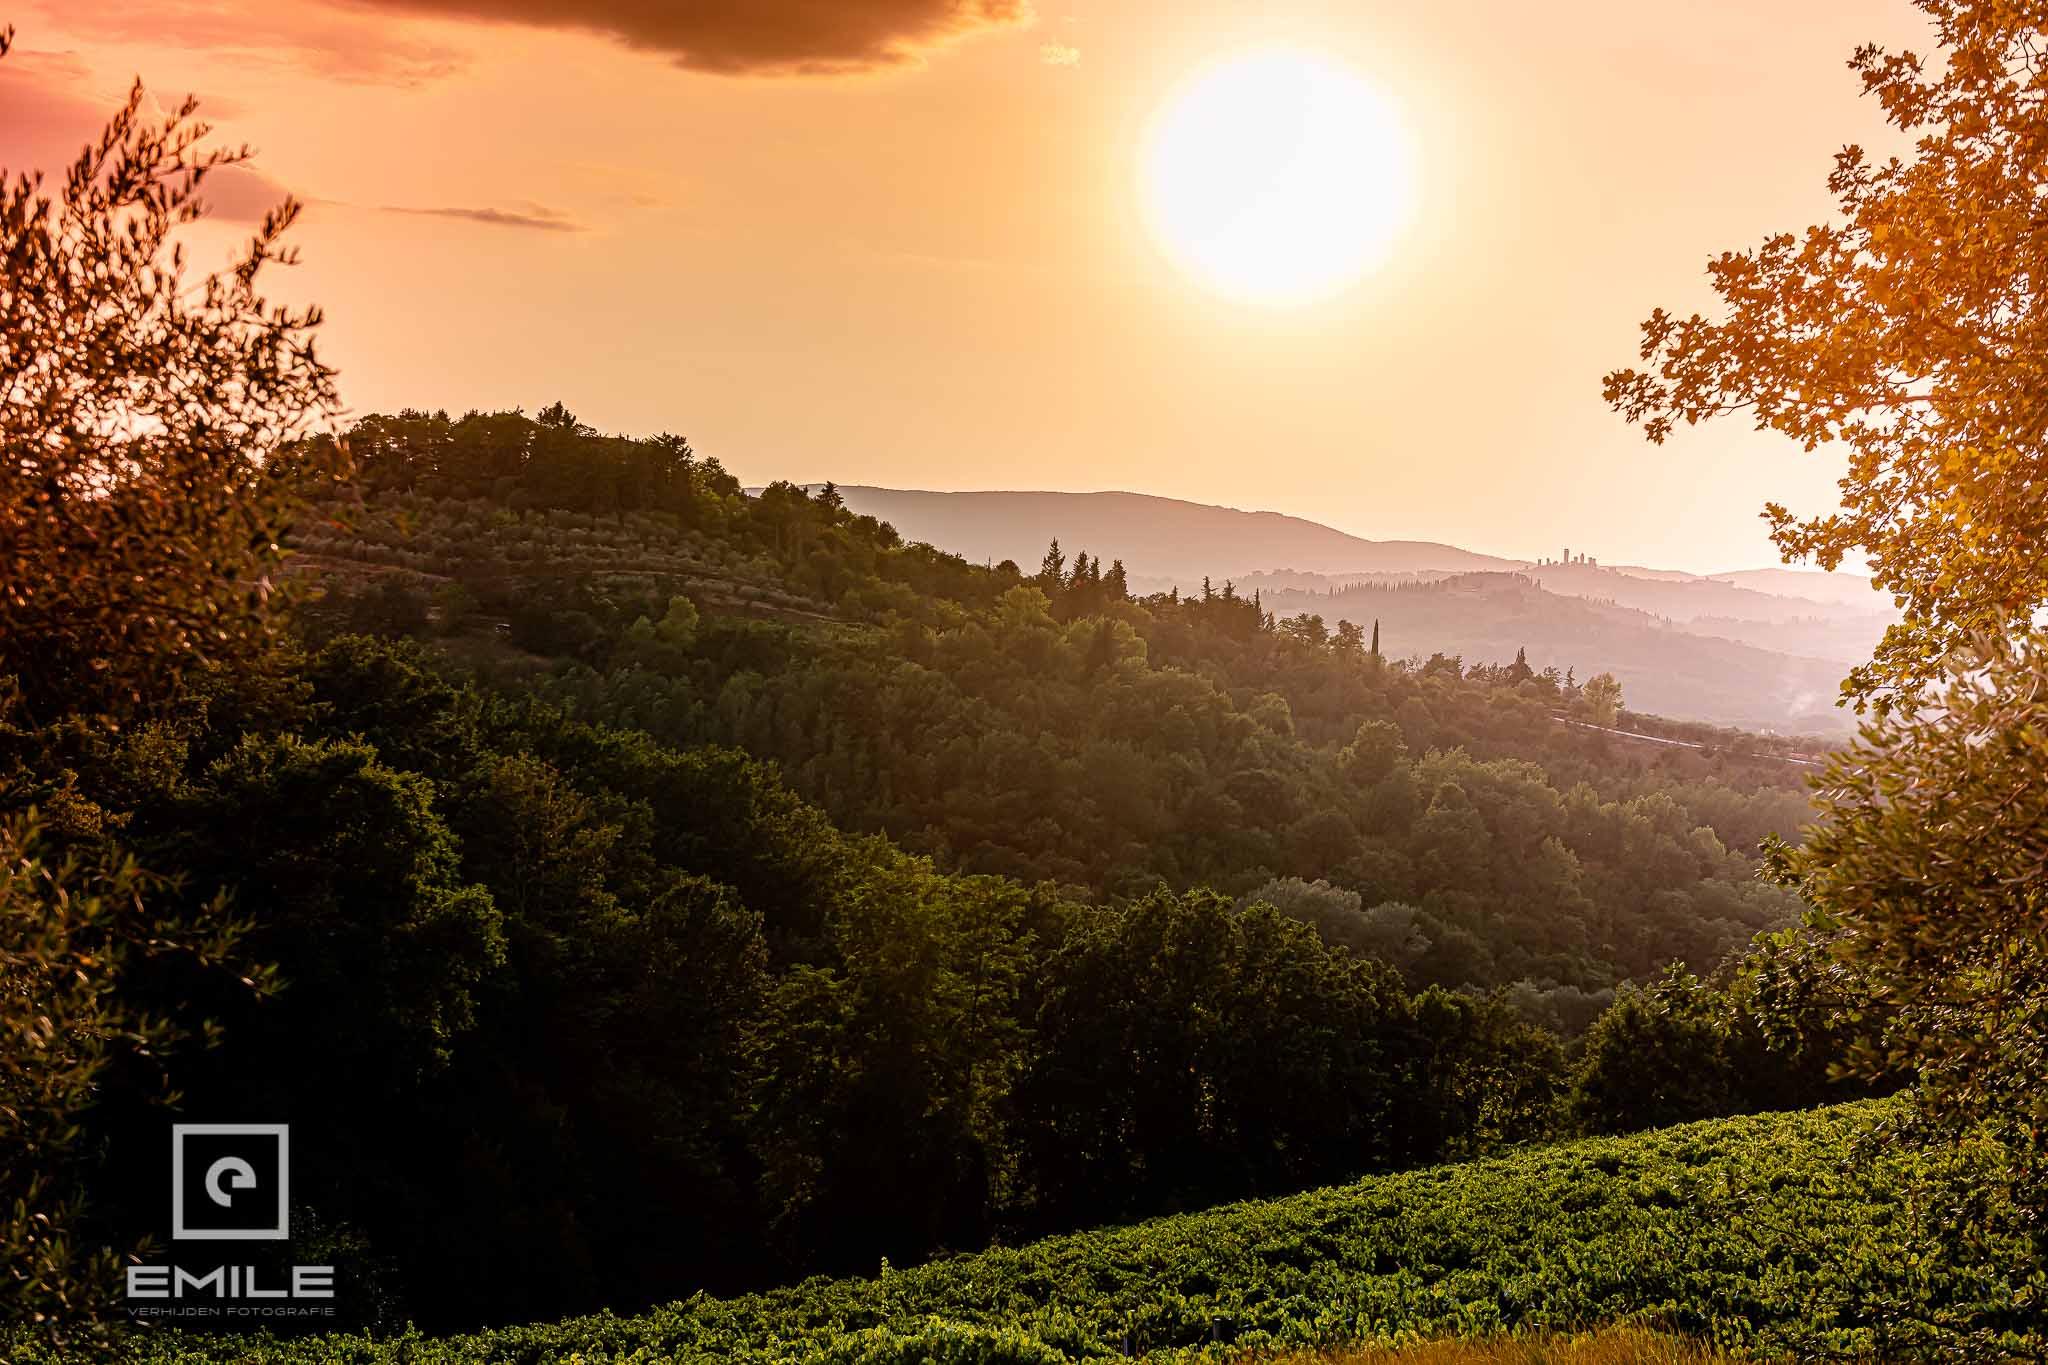 Landschaps foto in de avond - Destination wedding San Gimignano - Toscane Italie - Iris en Job